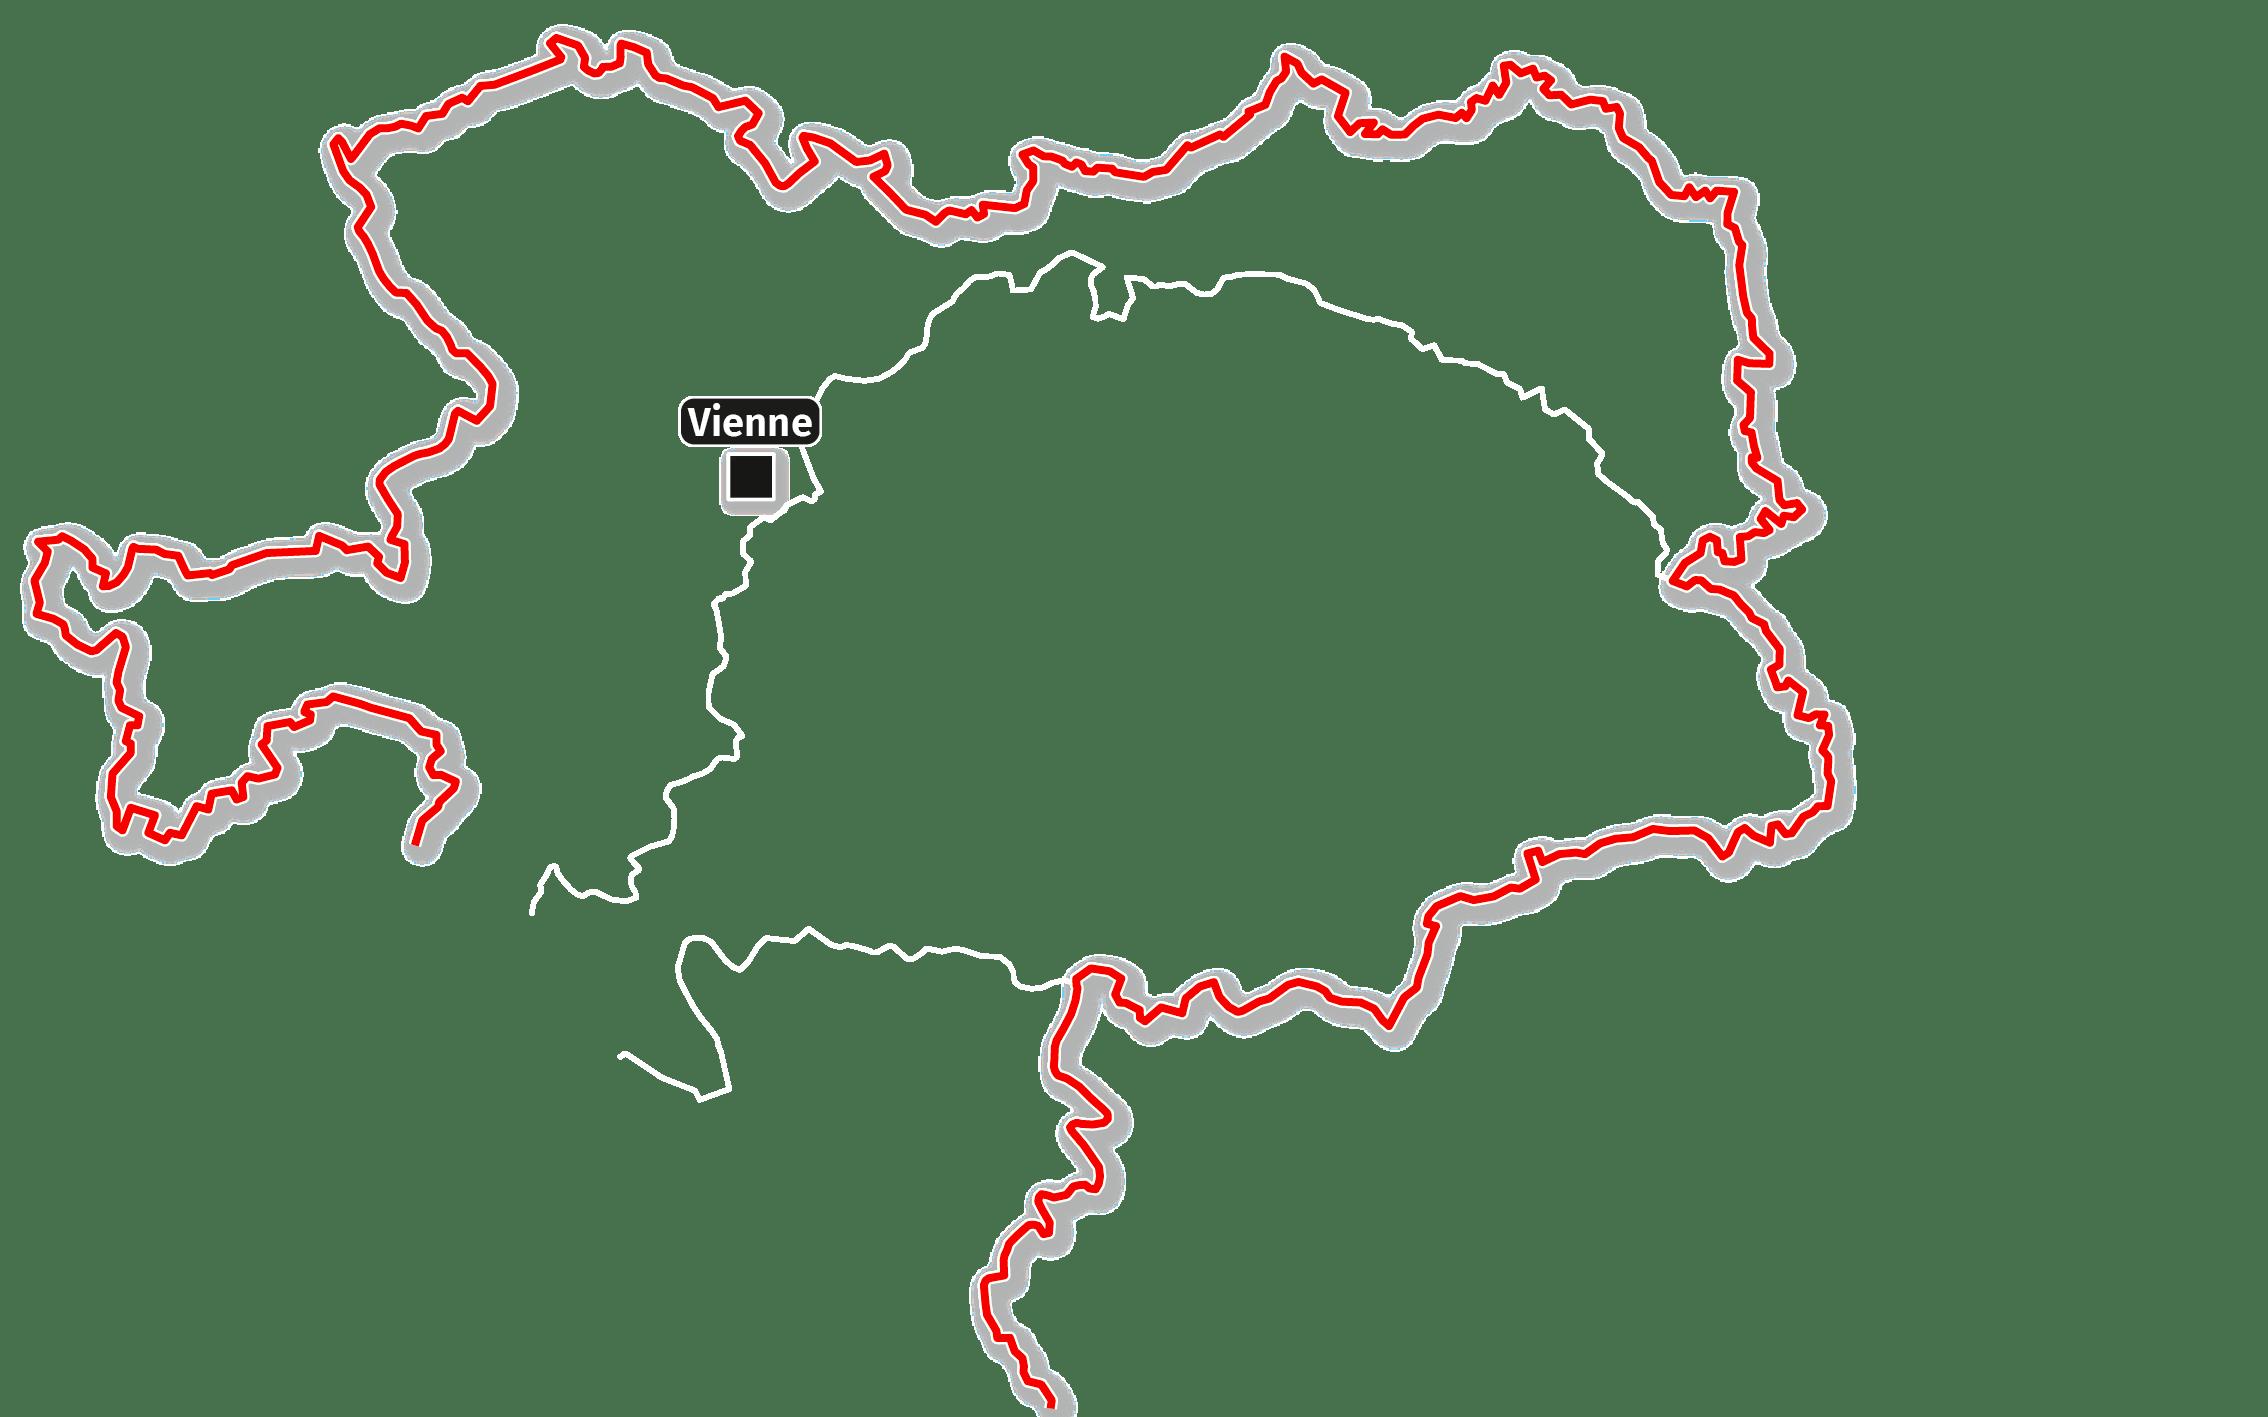 L'Empire austro-hongrois (texte)